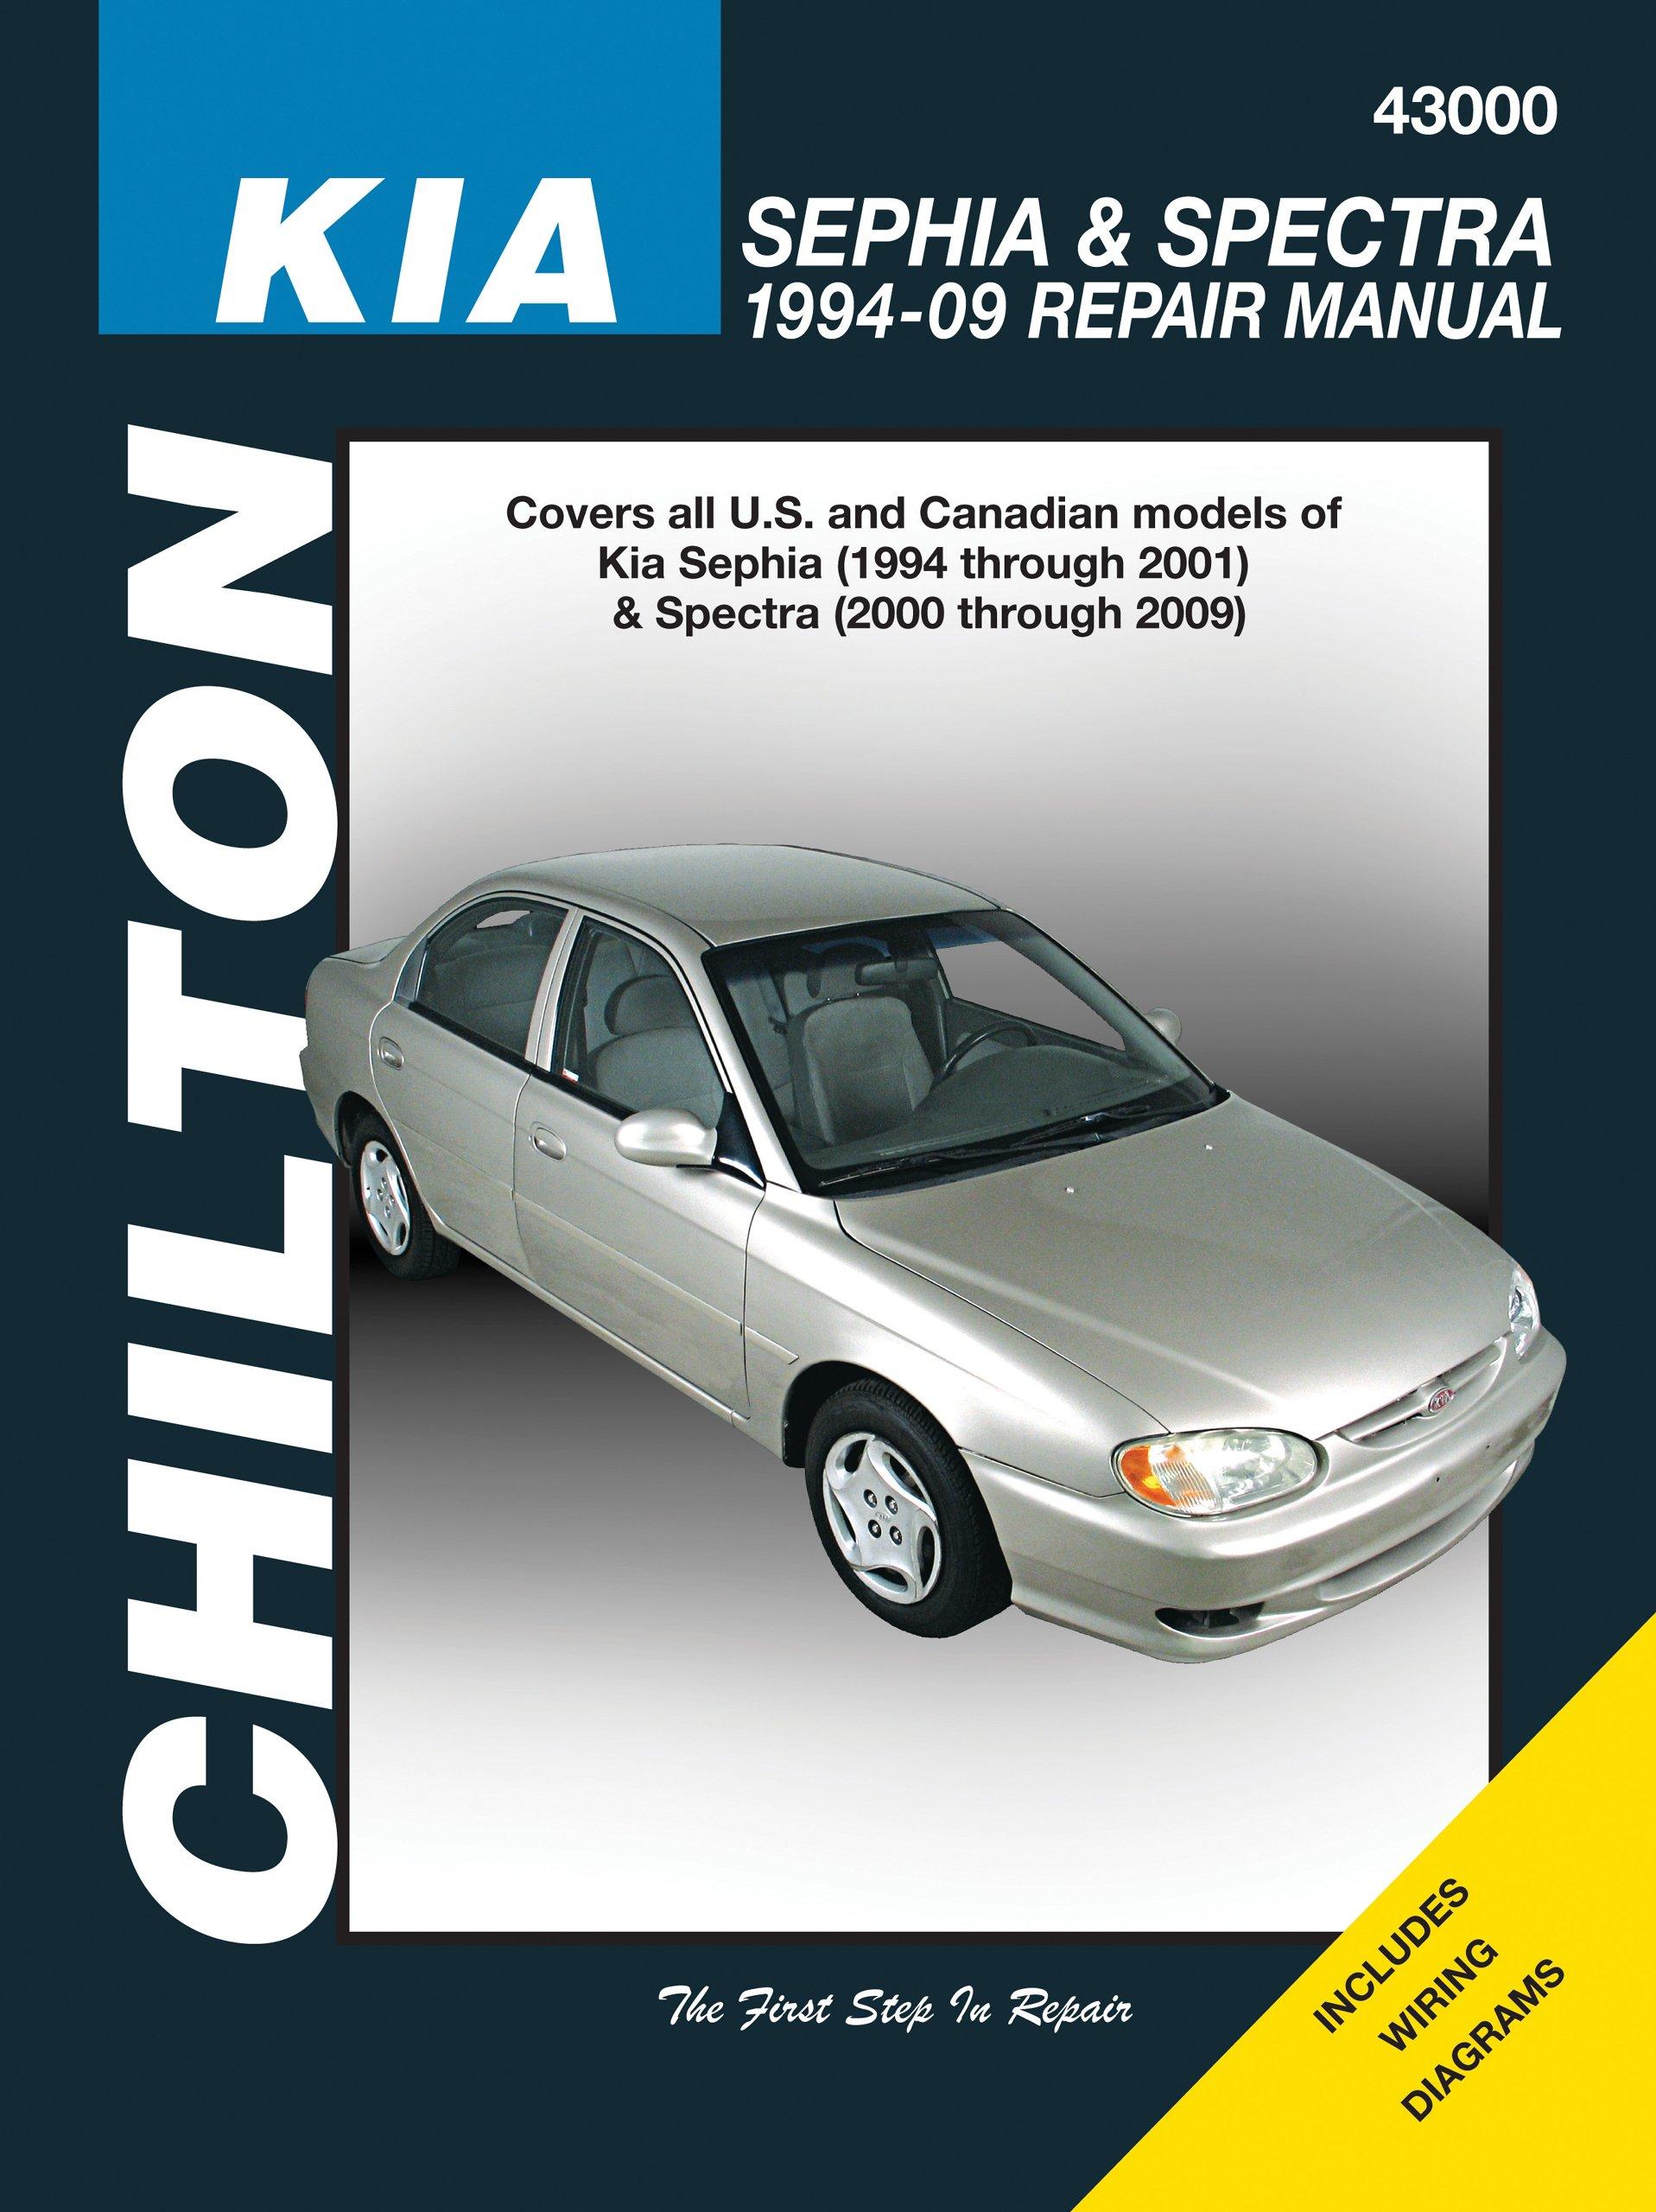 KIA Sephia & Spectra 1994-09 Repair Manual (Chilton's Total Car Care Repair  Manuals): Amazon.co.uk: Joe L Hamilton: 9781563928390: Books